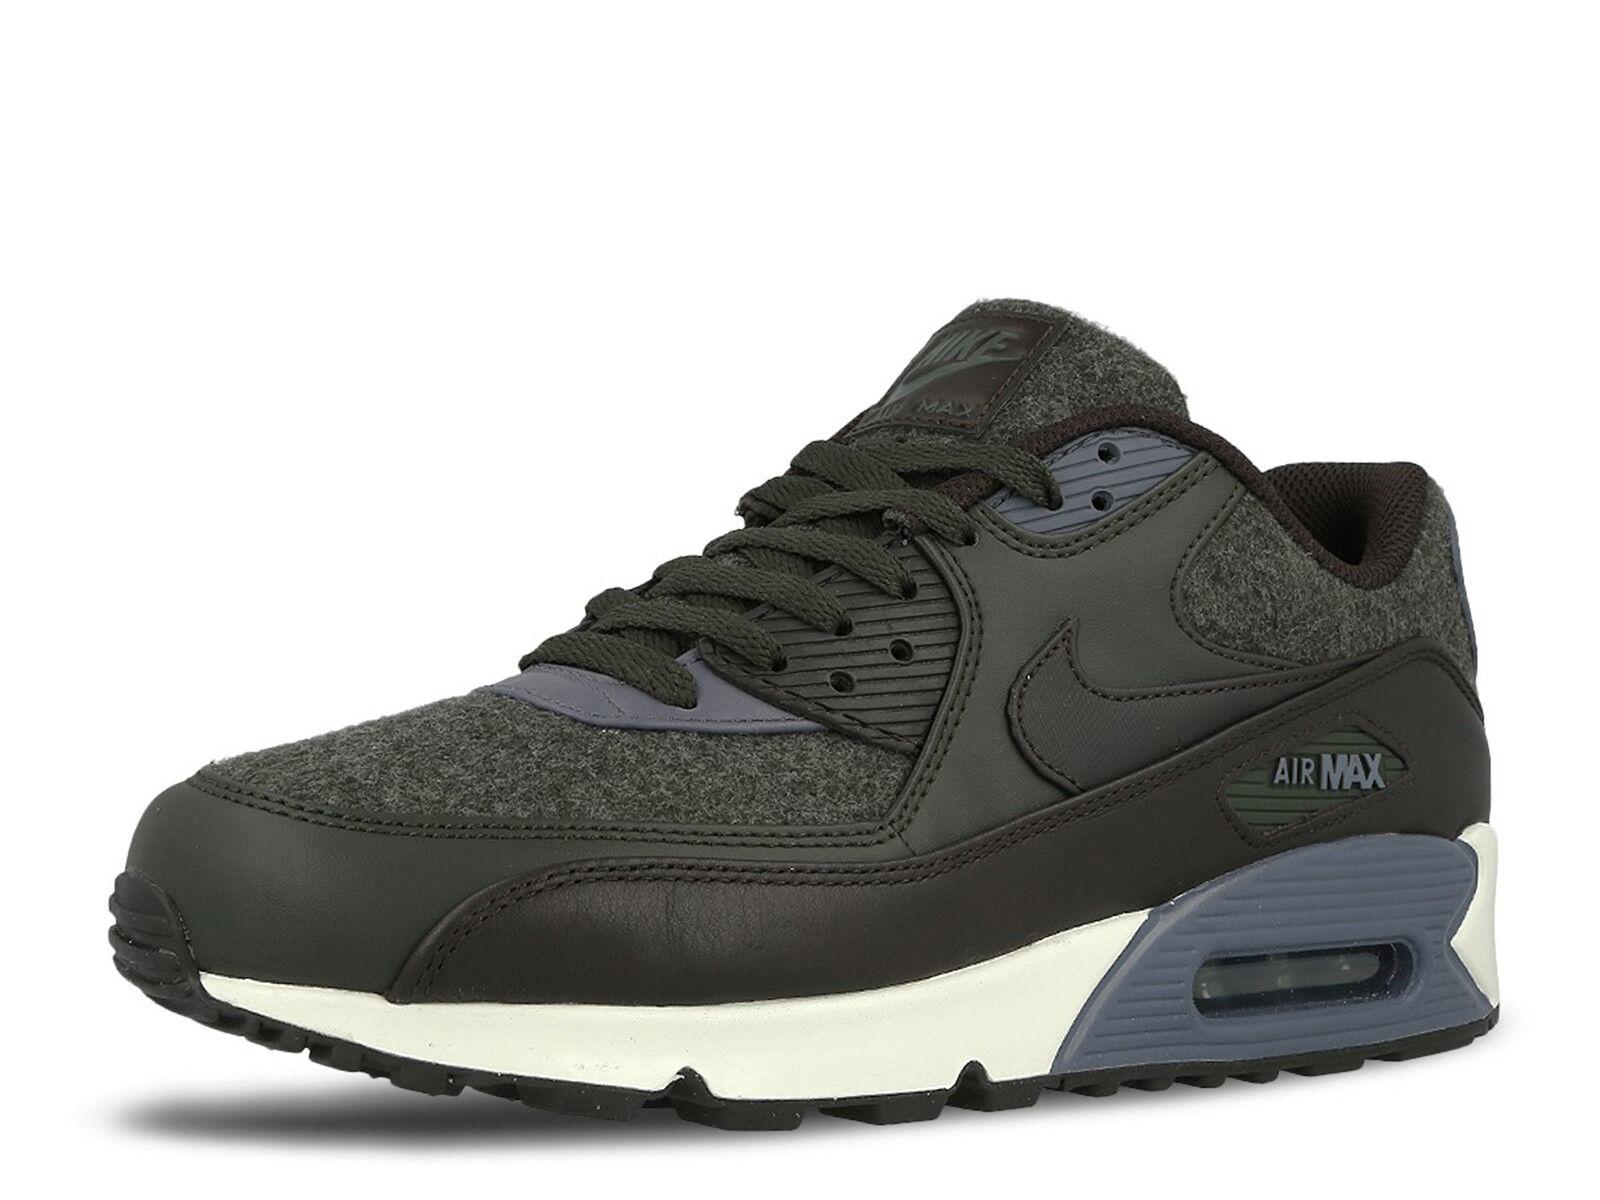 Nike Air Max 90 Premium Wool 700155-300 Sequoia Velvet Brown Mens Sz 9.5